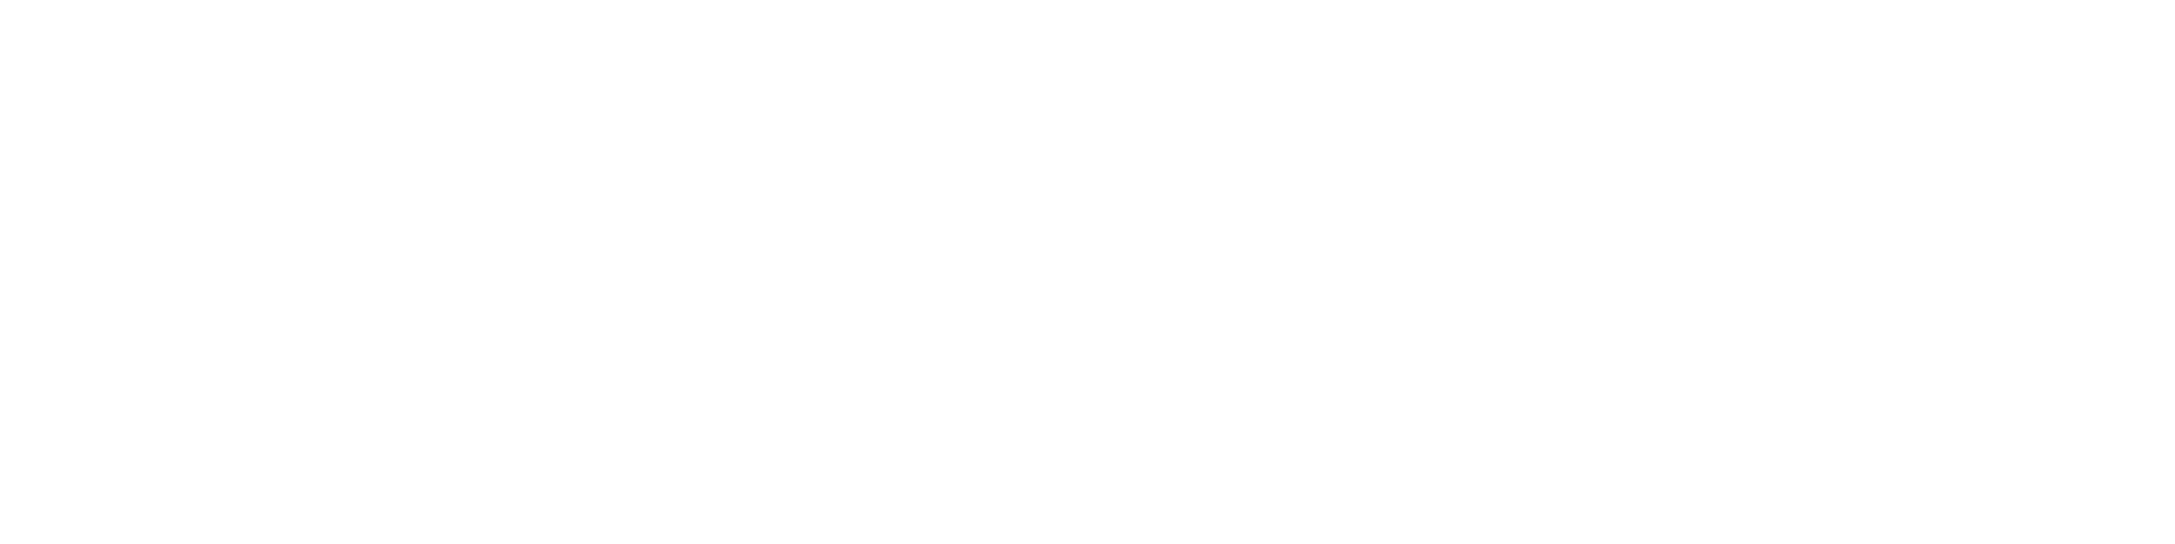 edumed-logo-300.png